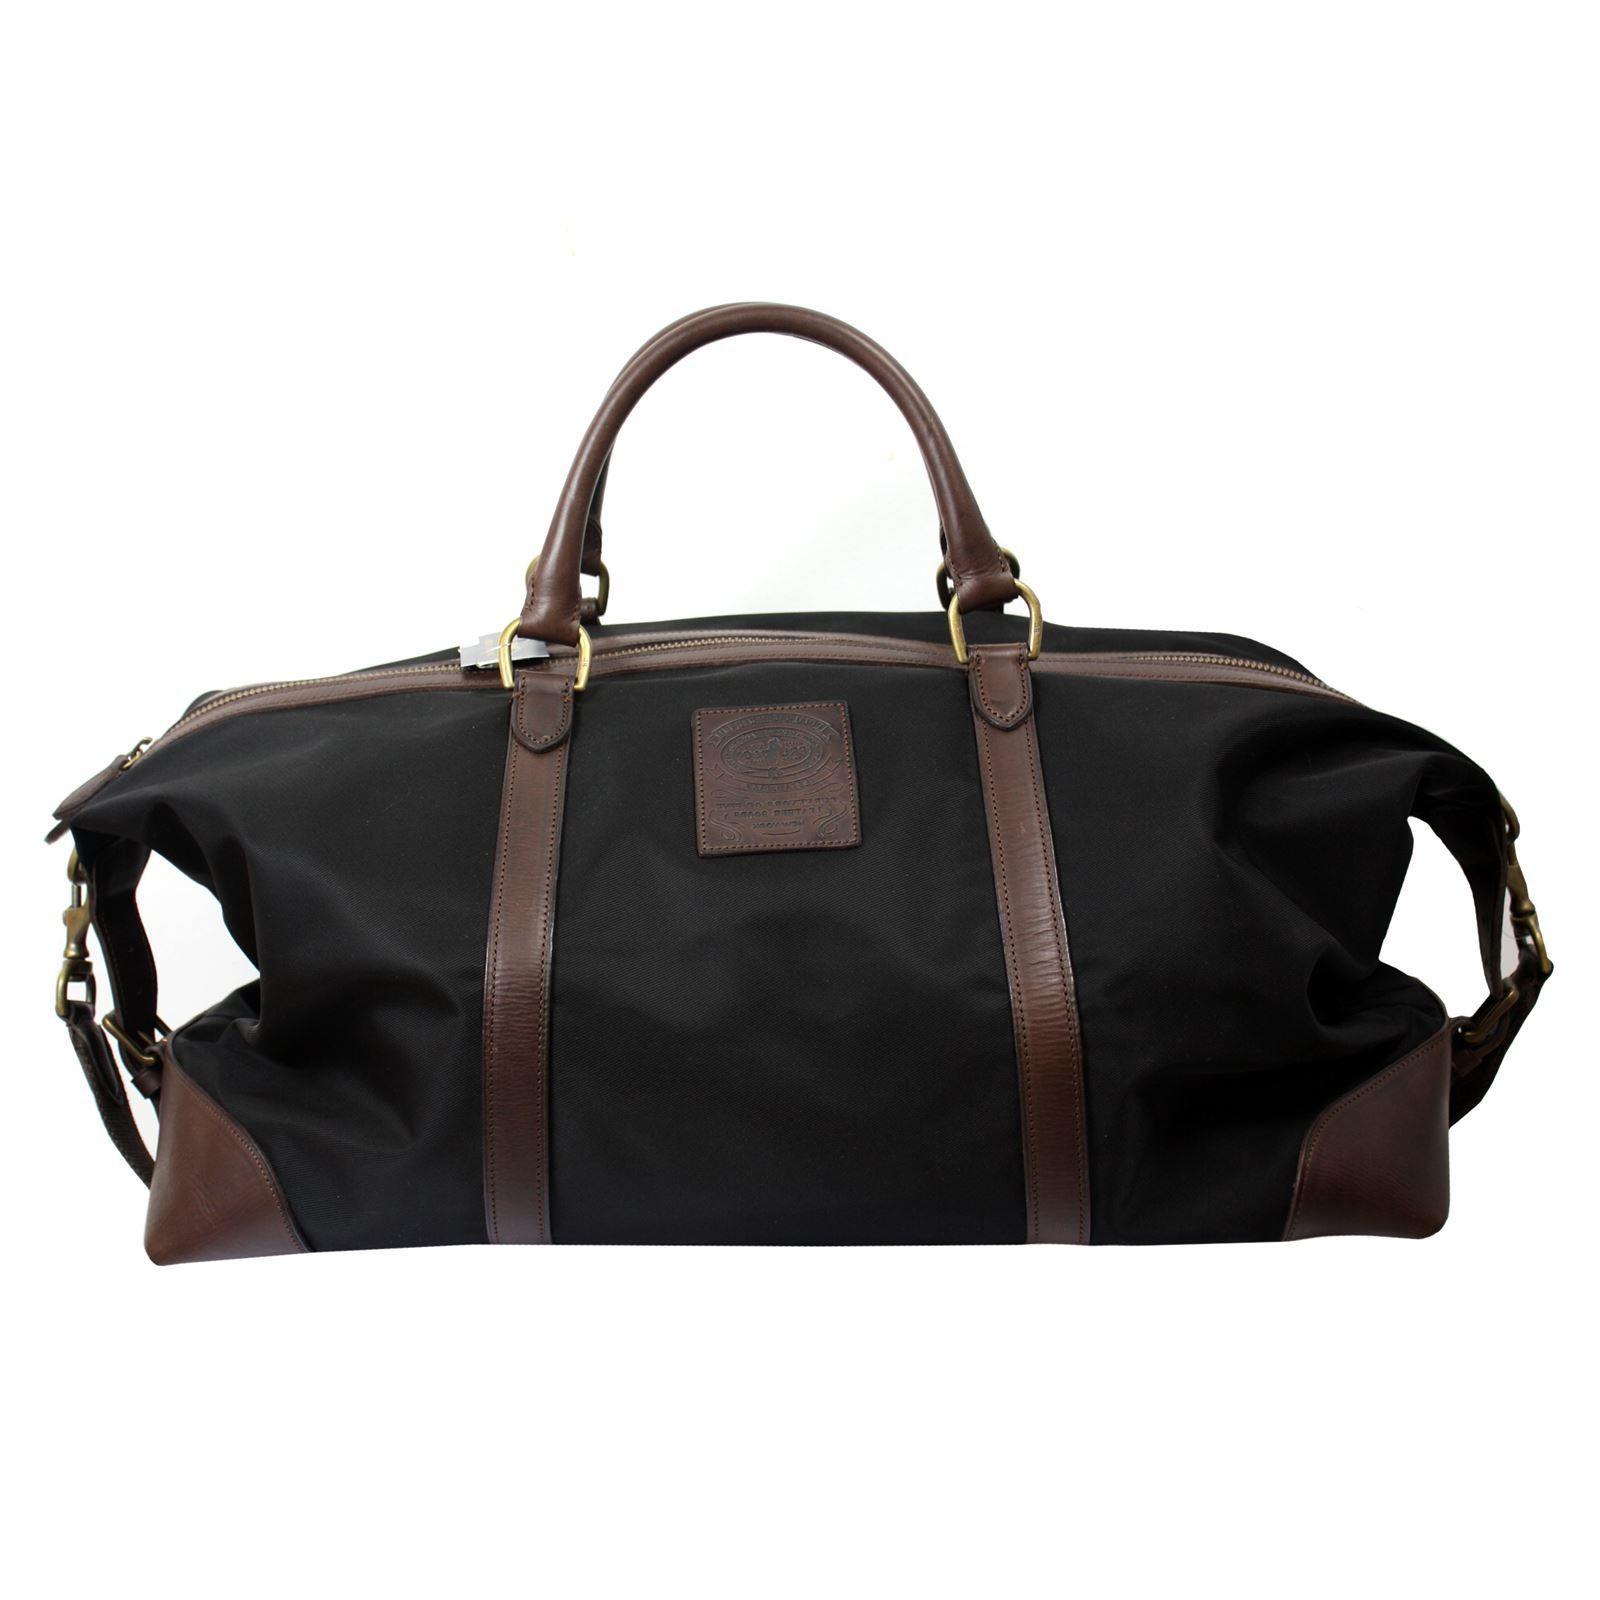 ralph lauren duffle bag duffel bags canada leather duffle bag